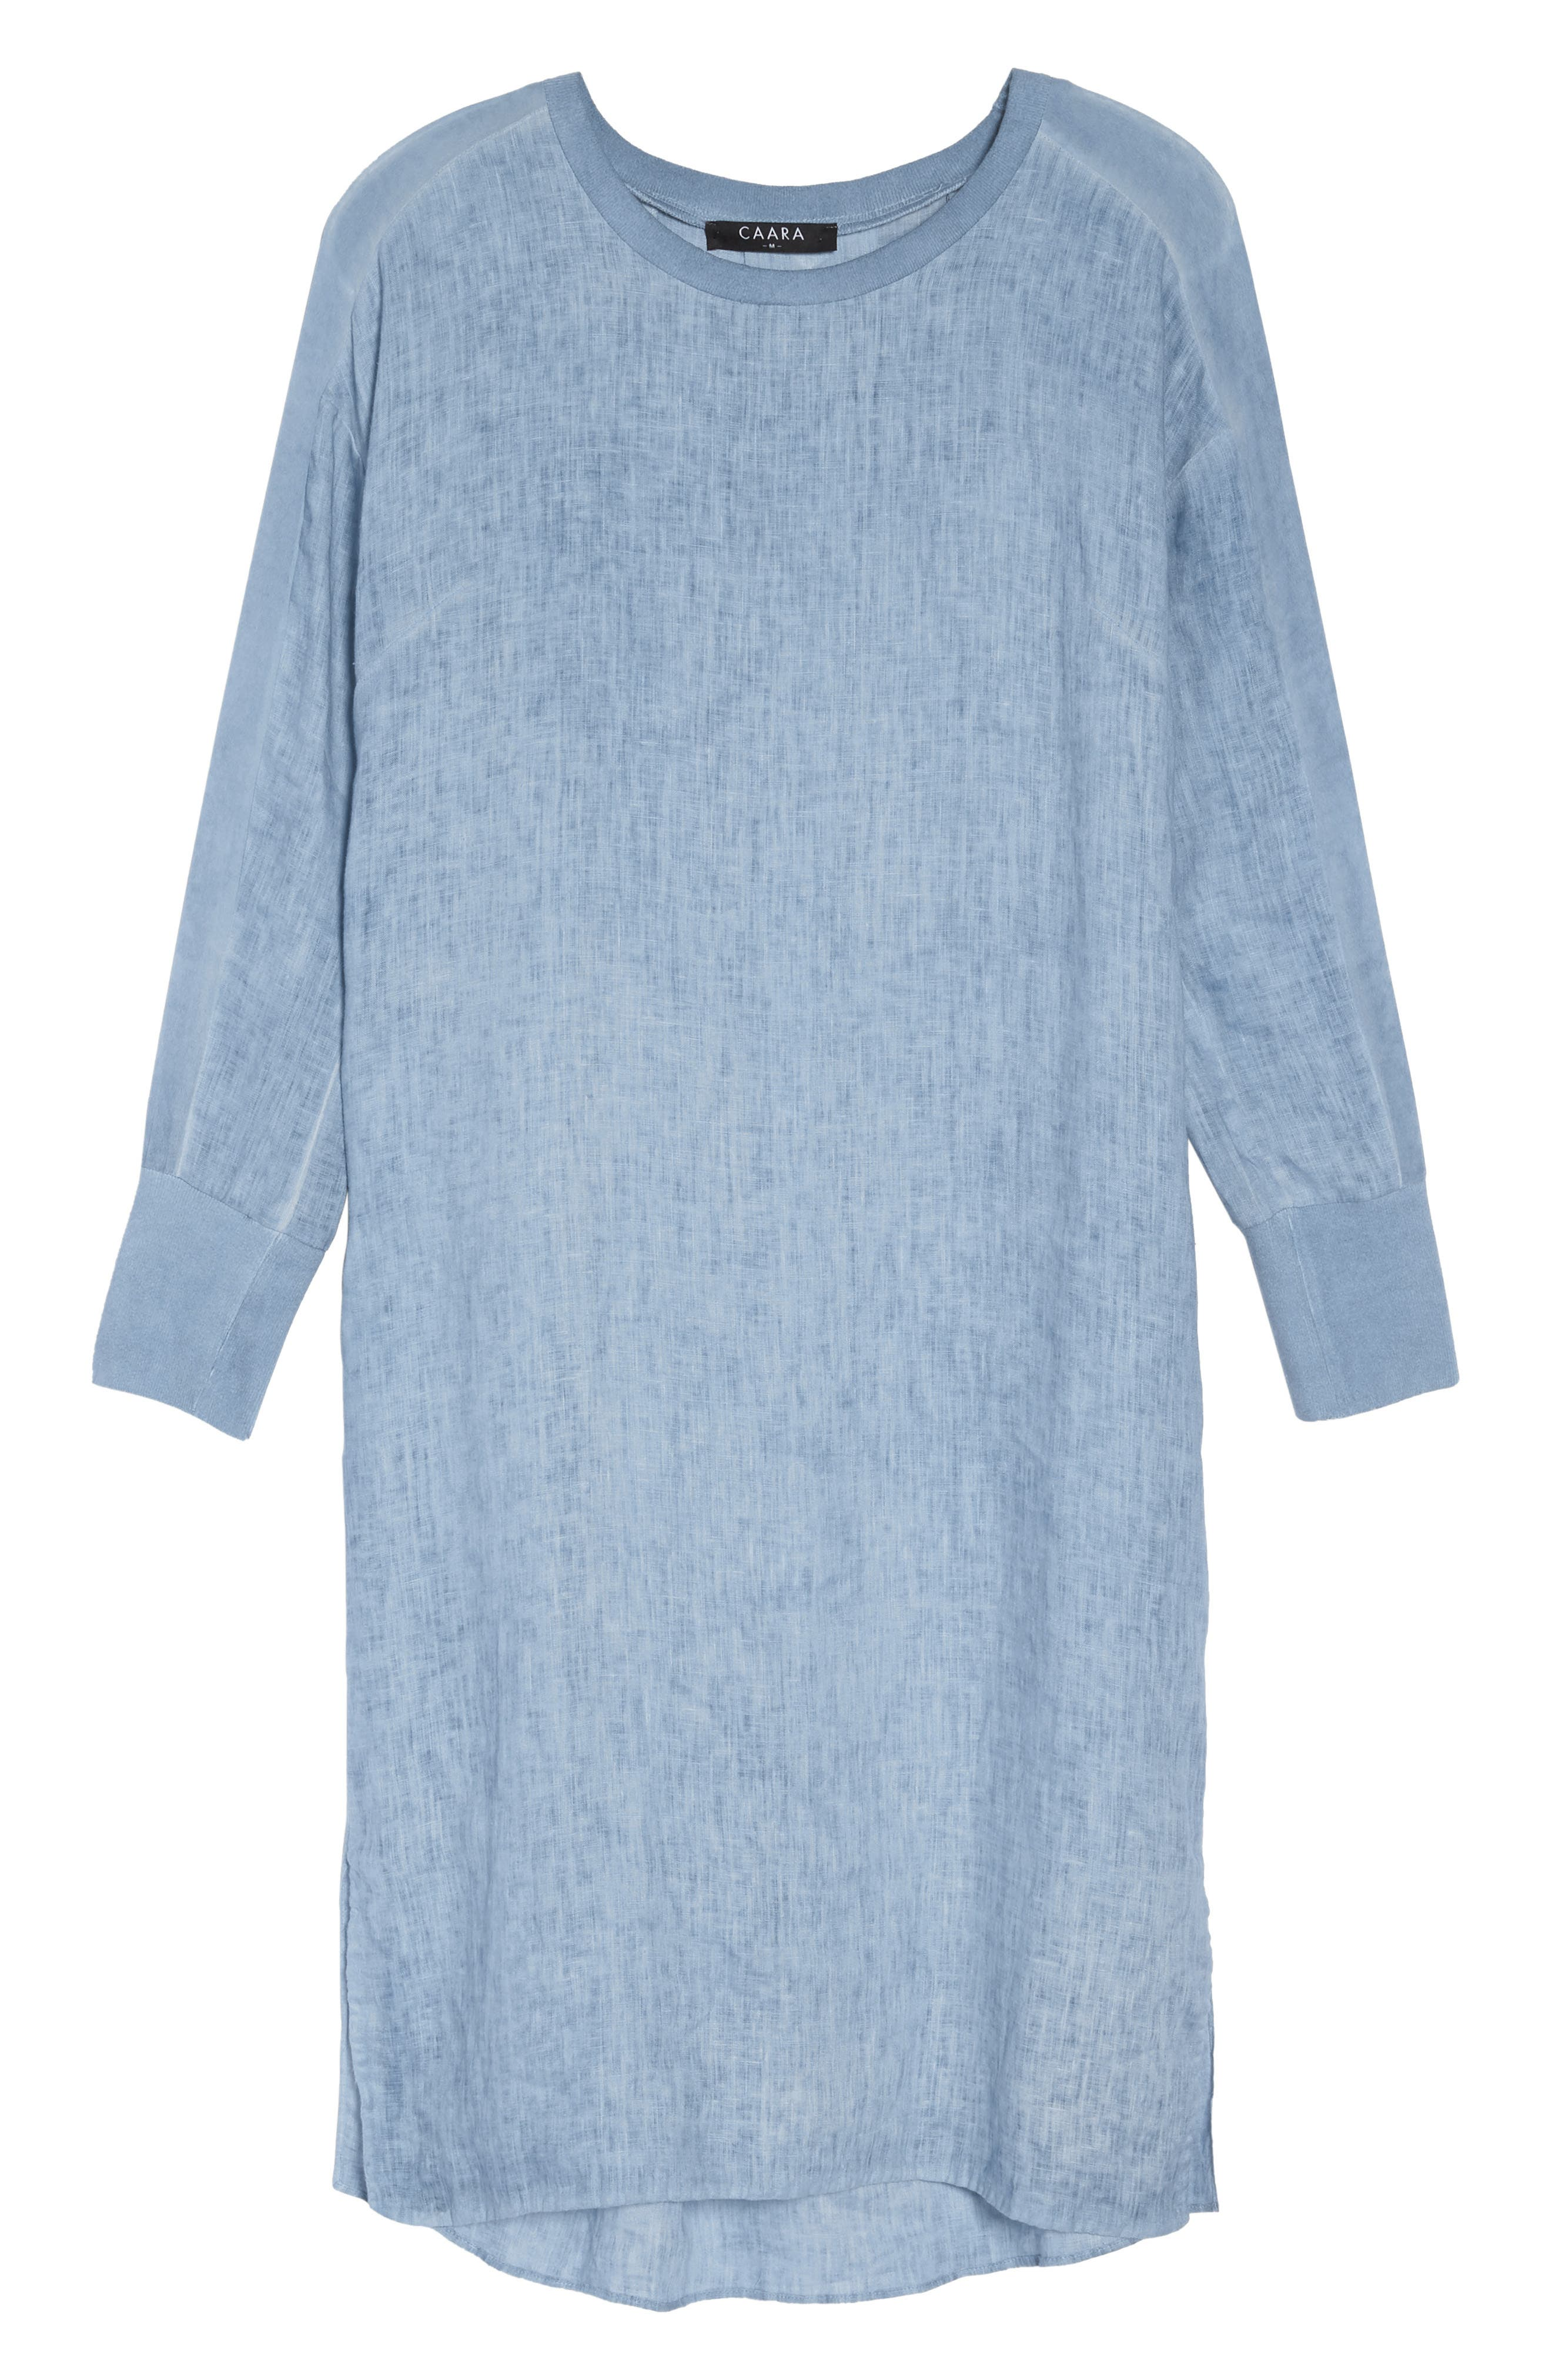 Rata Linen Shift Dress,                             Alternate thumbnail 8, color,                             400